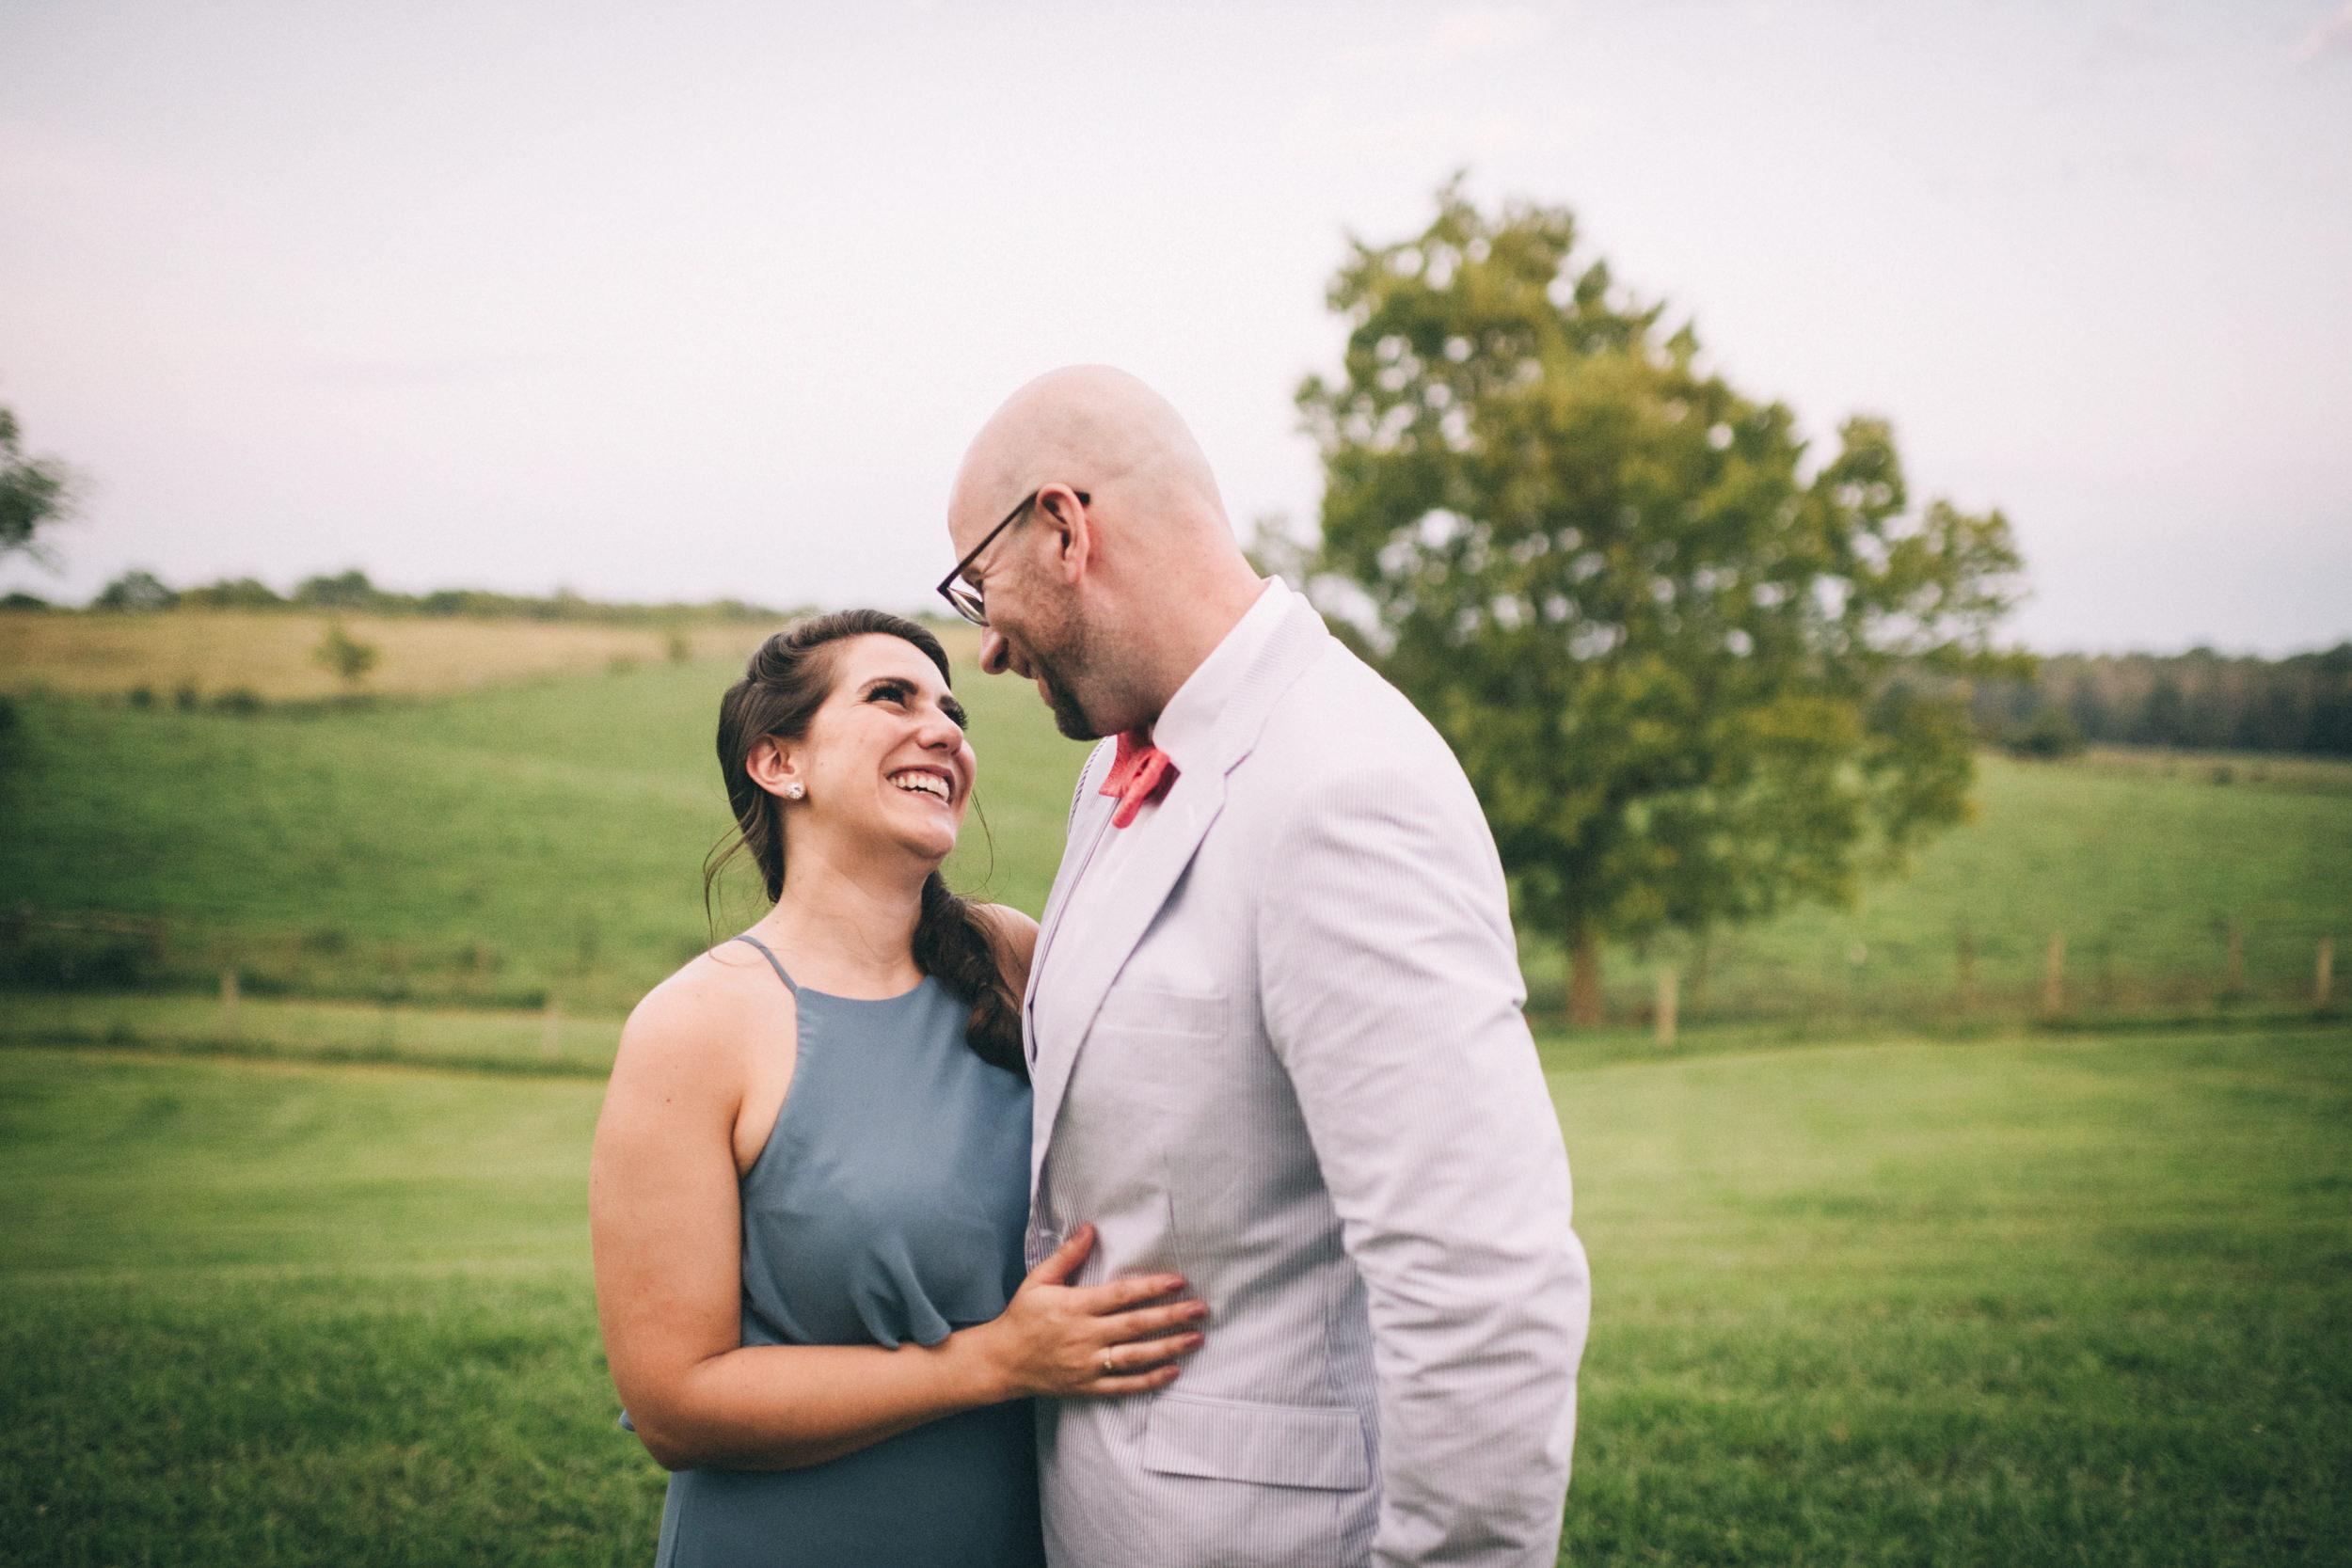 Louisville-Kentucky-Wedding-and-Elopement-Photographer-Sarah-Katherine-Davis-Photography-Summer-Jewel-Toned-Wedding-Chineese-Tea-Ceremony-Warrenwood-Manor-Danville-792.jpg